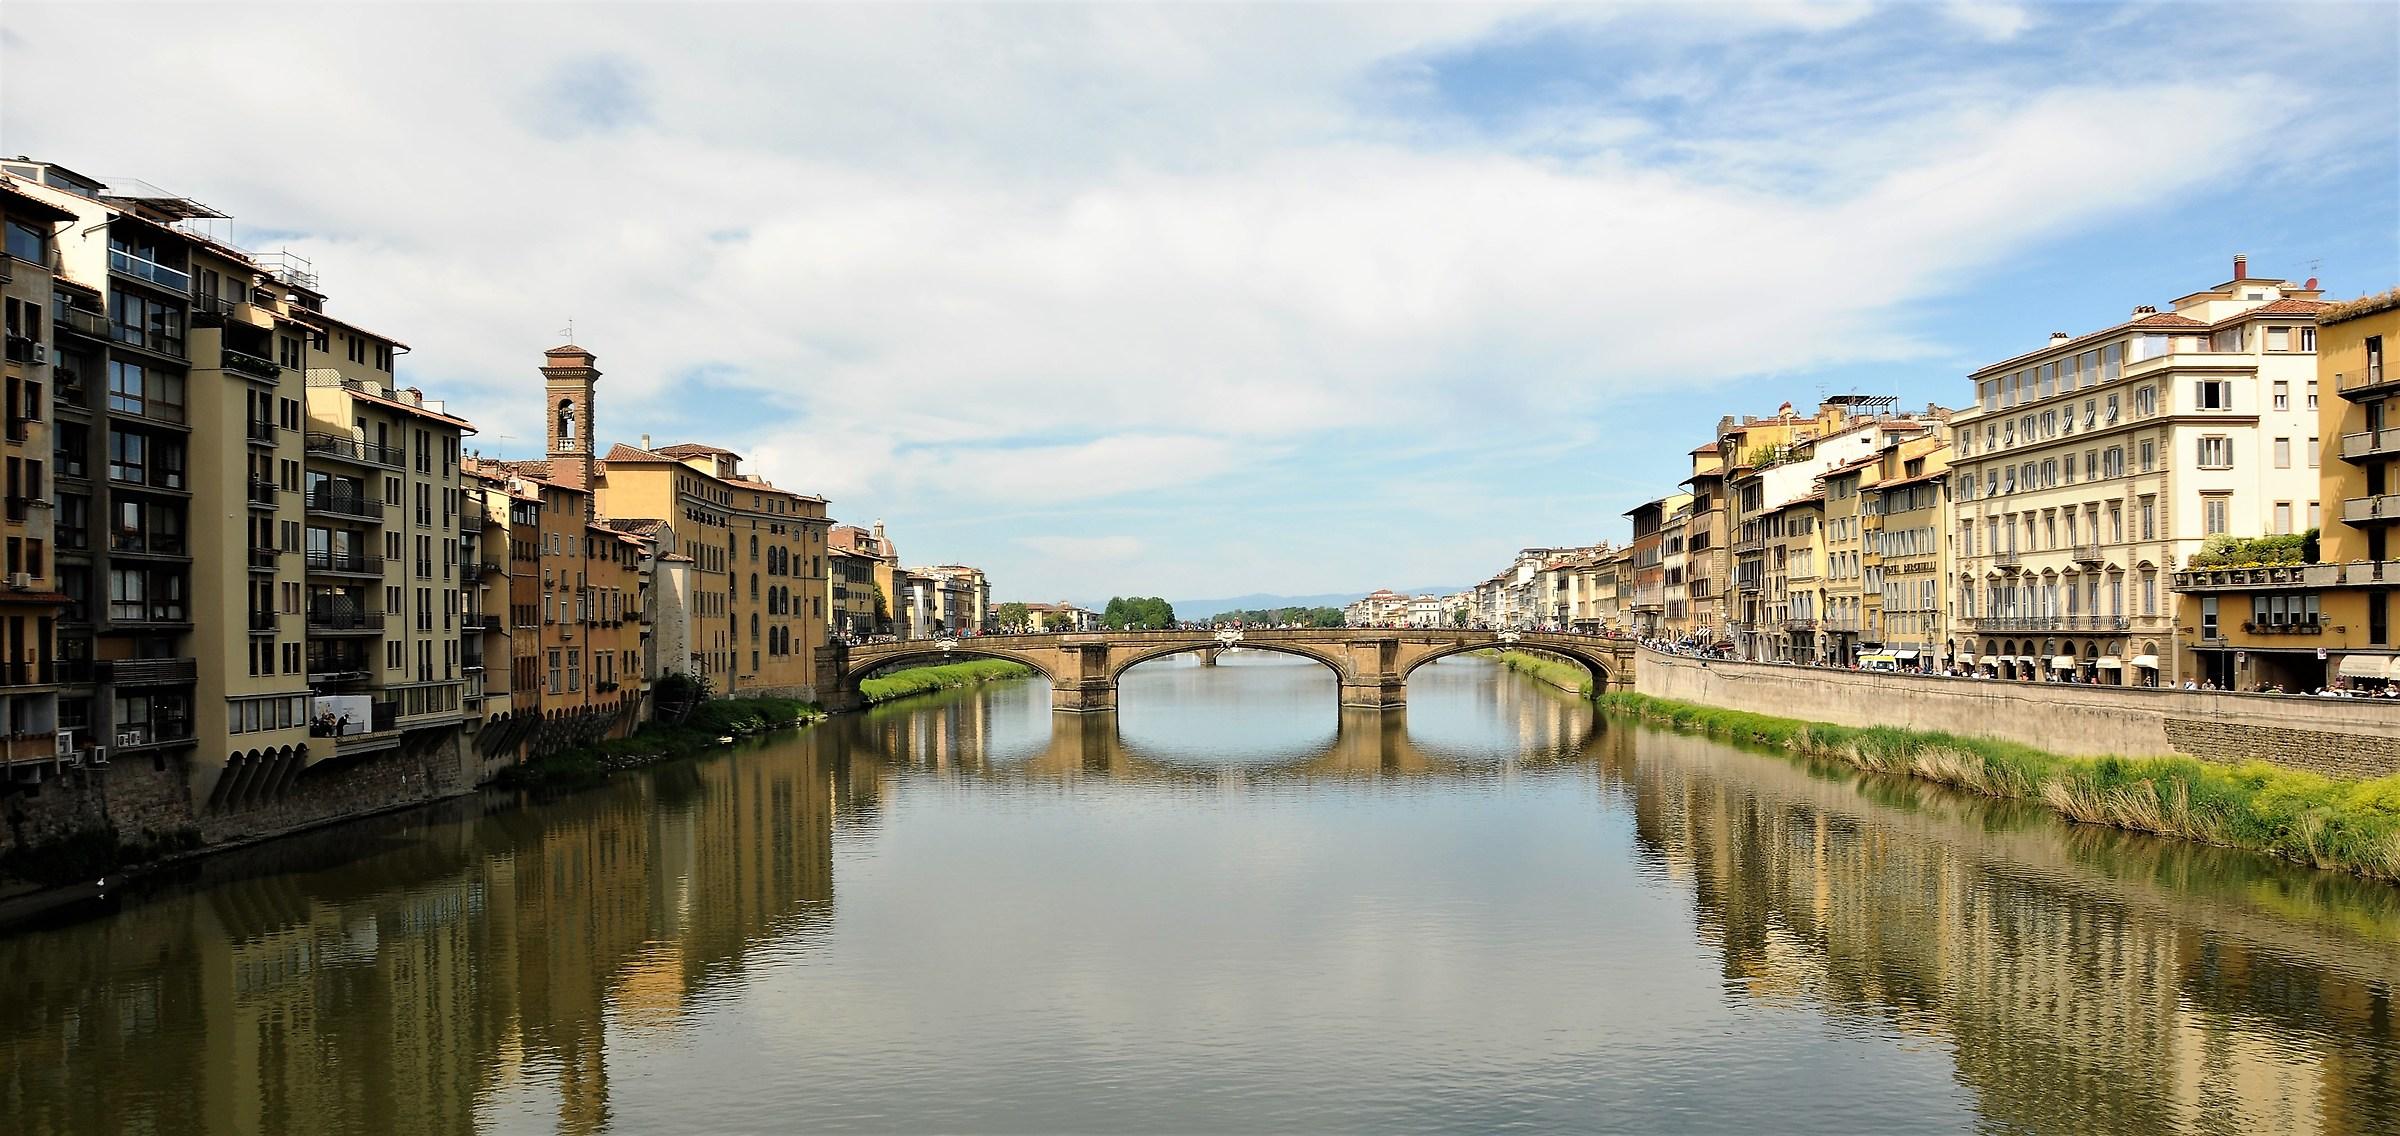 From Ponte Vecchio...